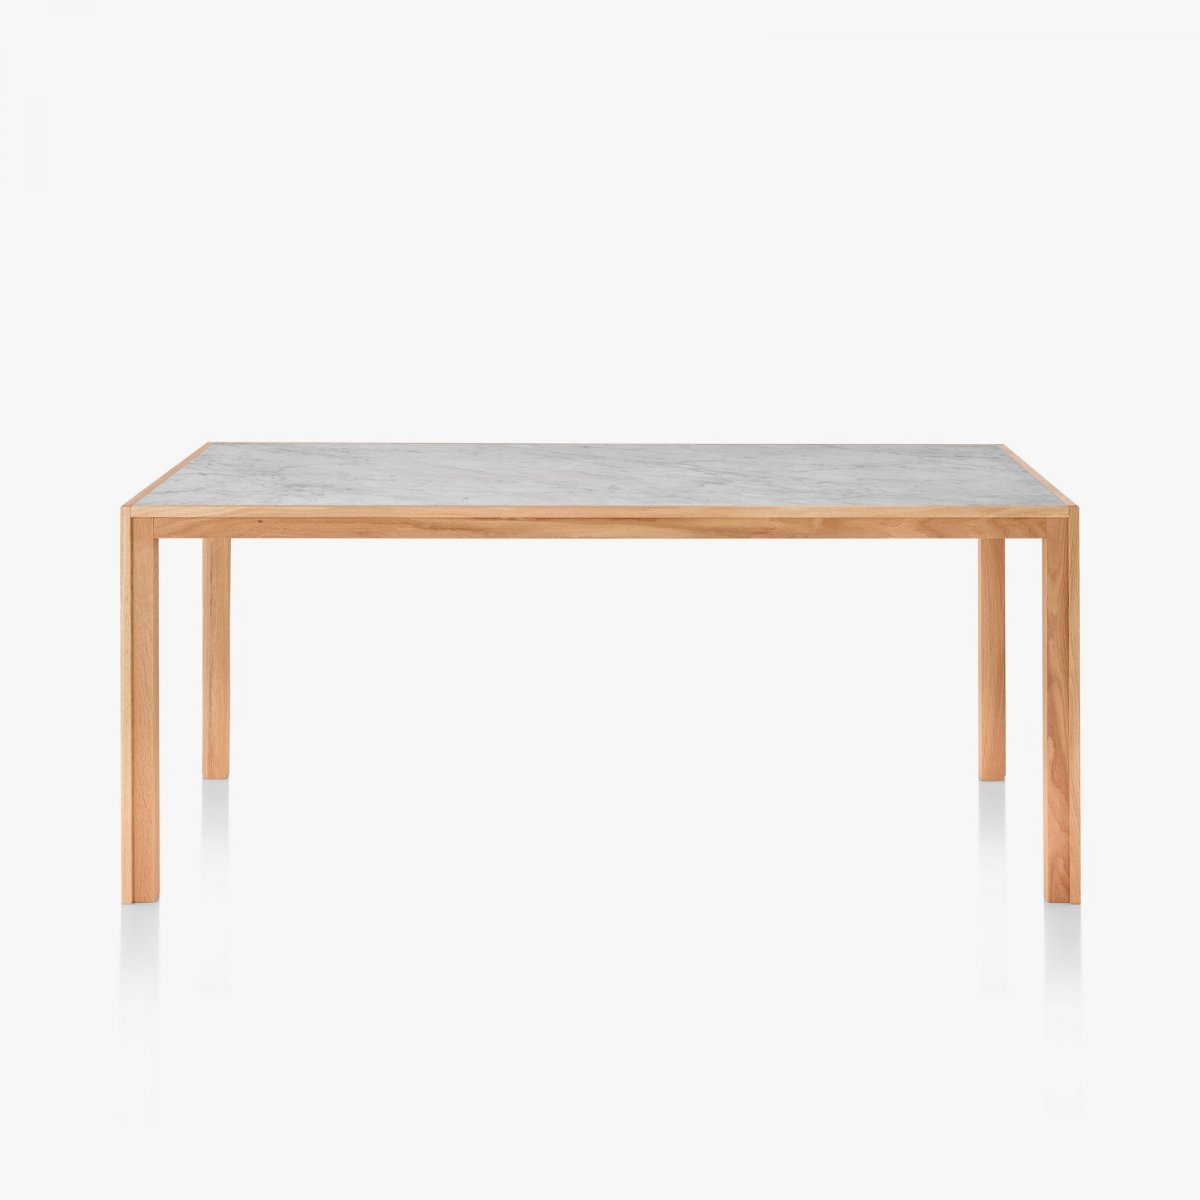 Doubleframe Table, Carrara/Oak.